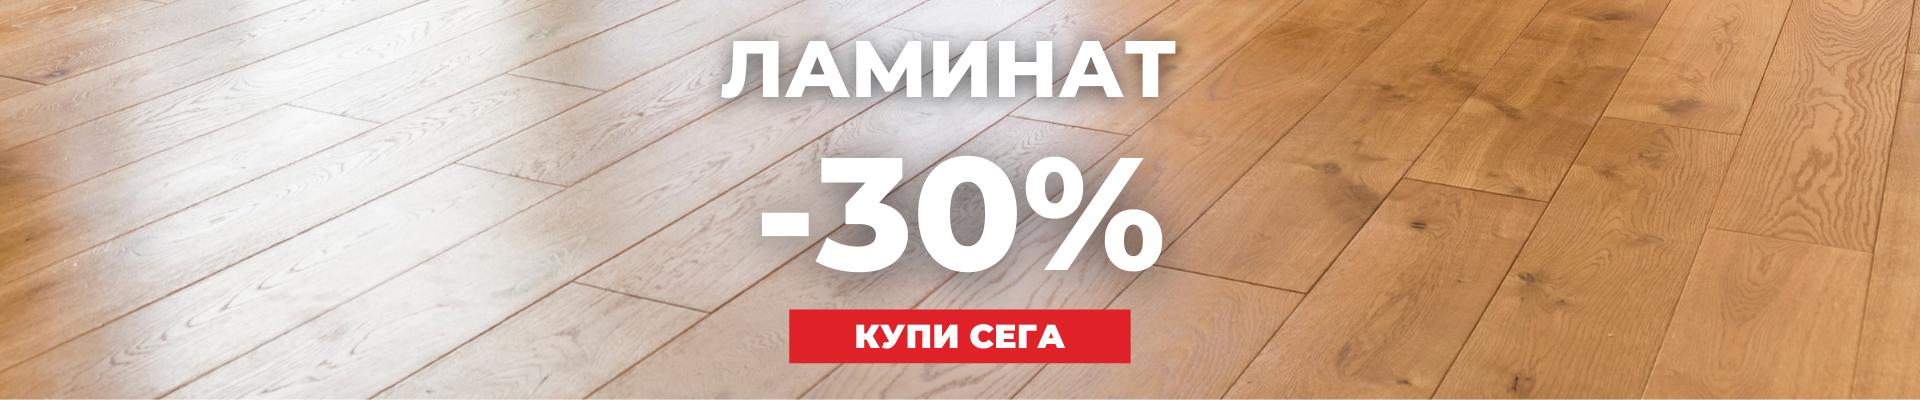 Ламинат -30% нов